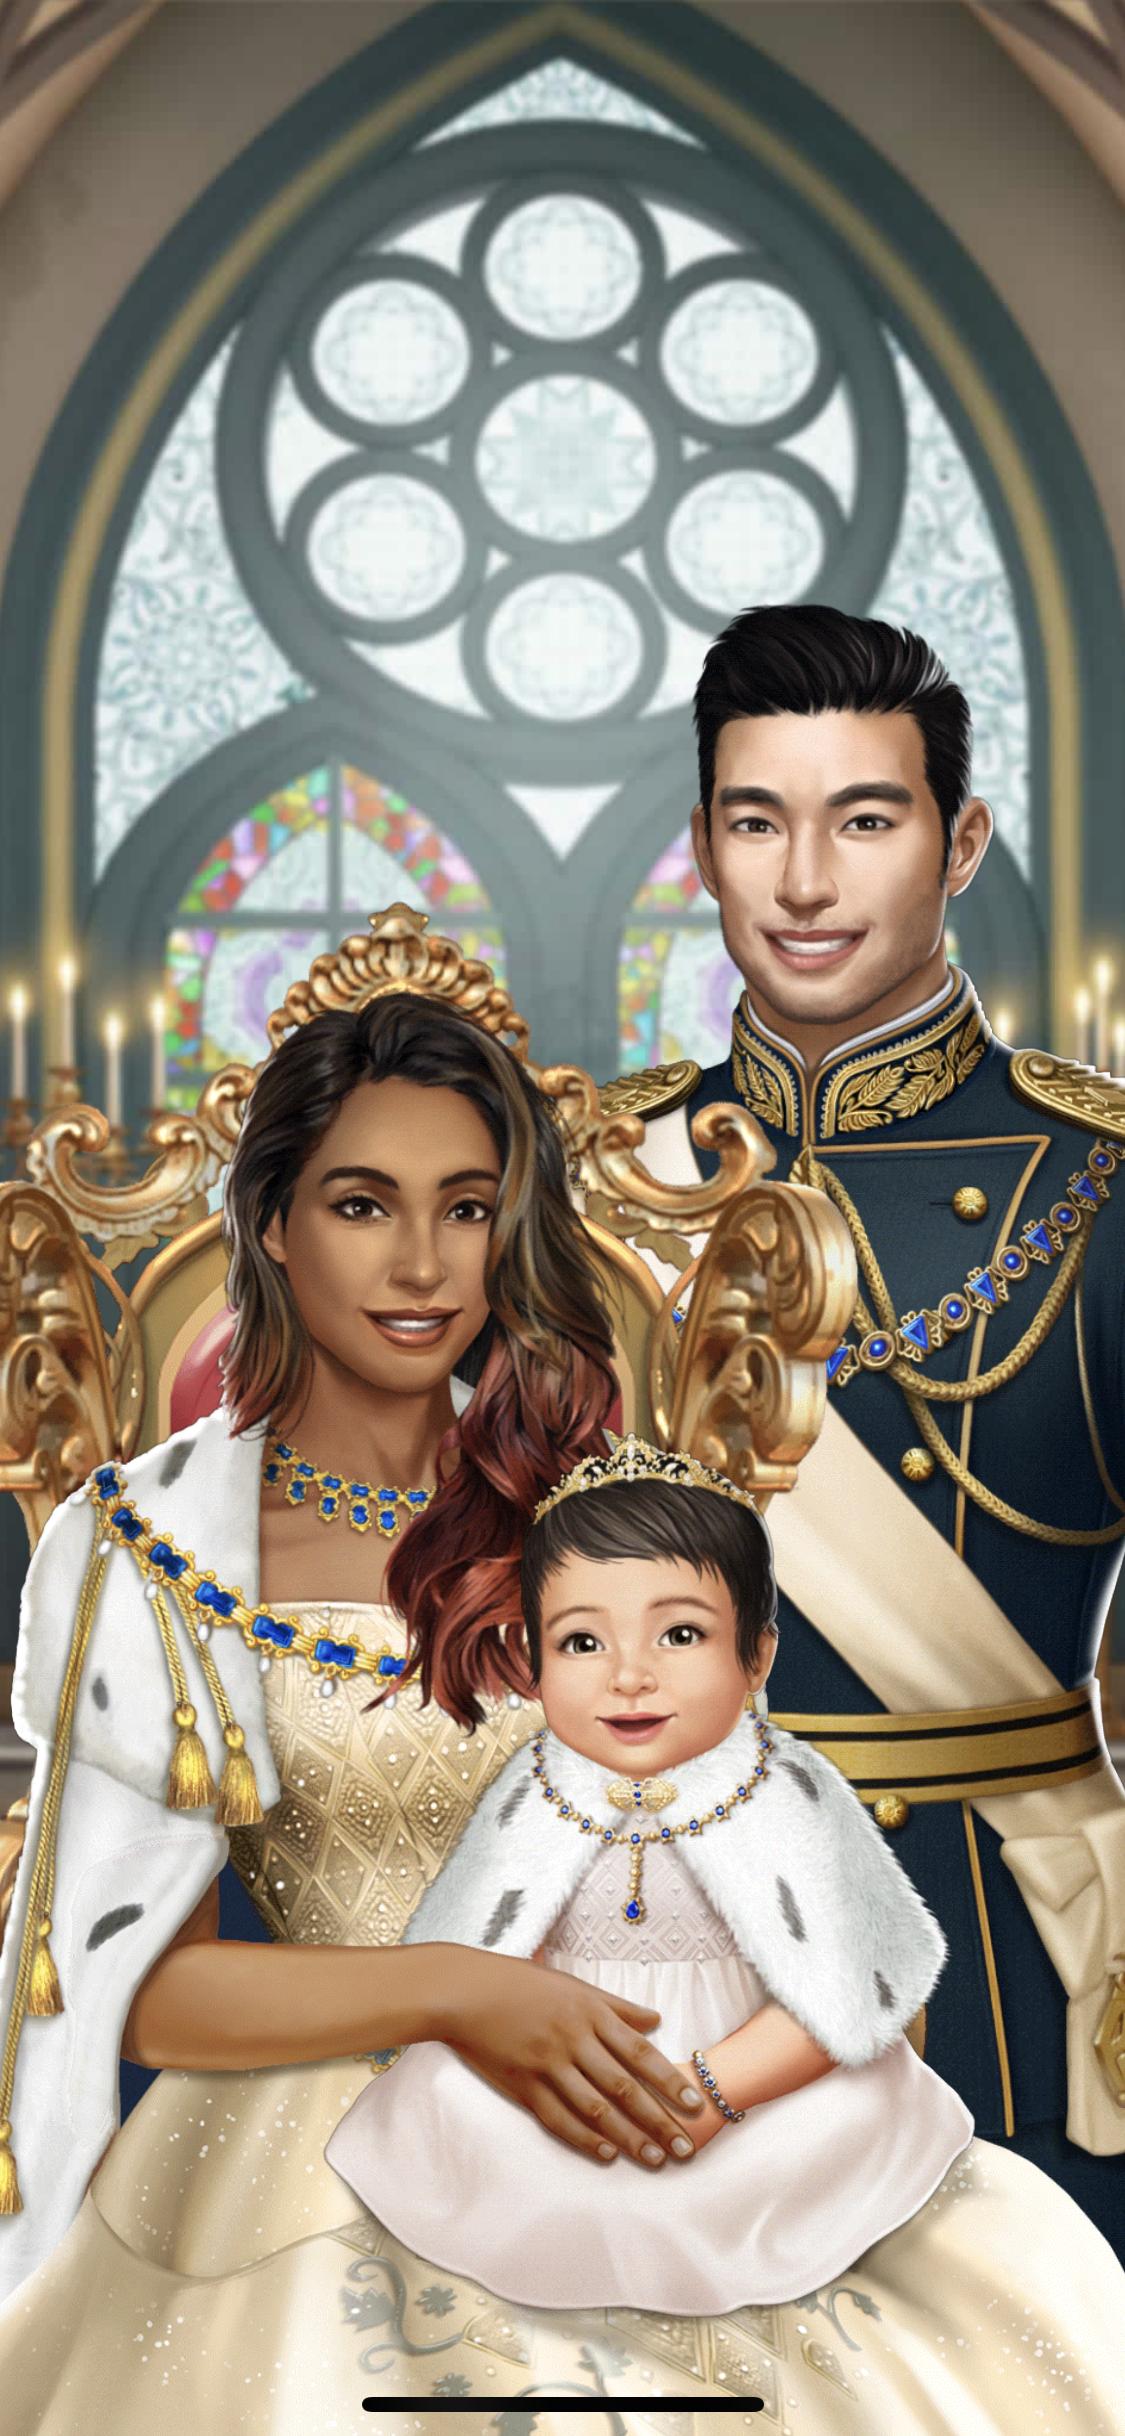 Family Photo! King Liam, Queen Lea & Crown Princess